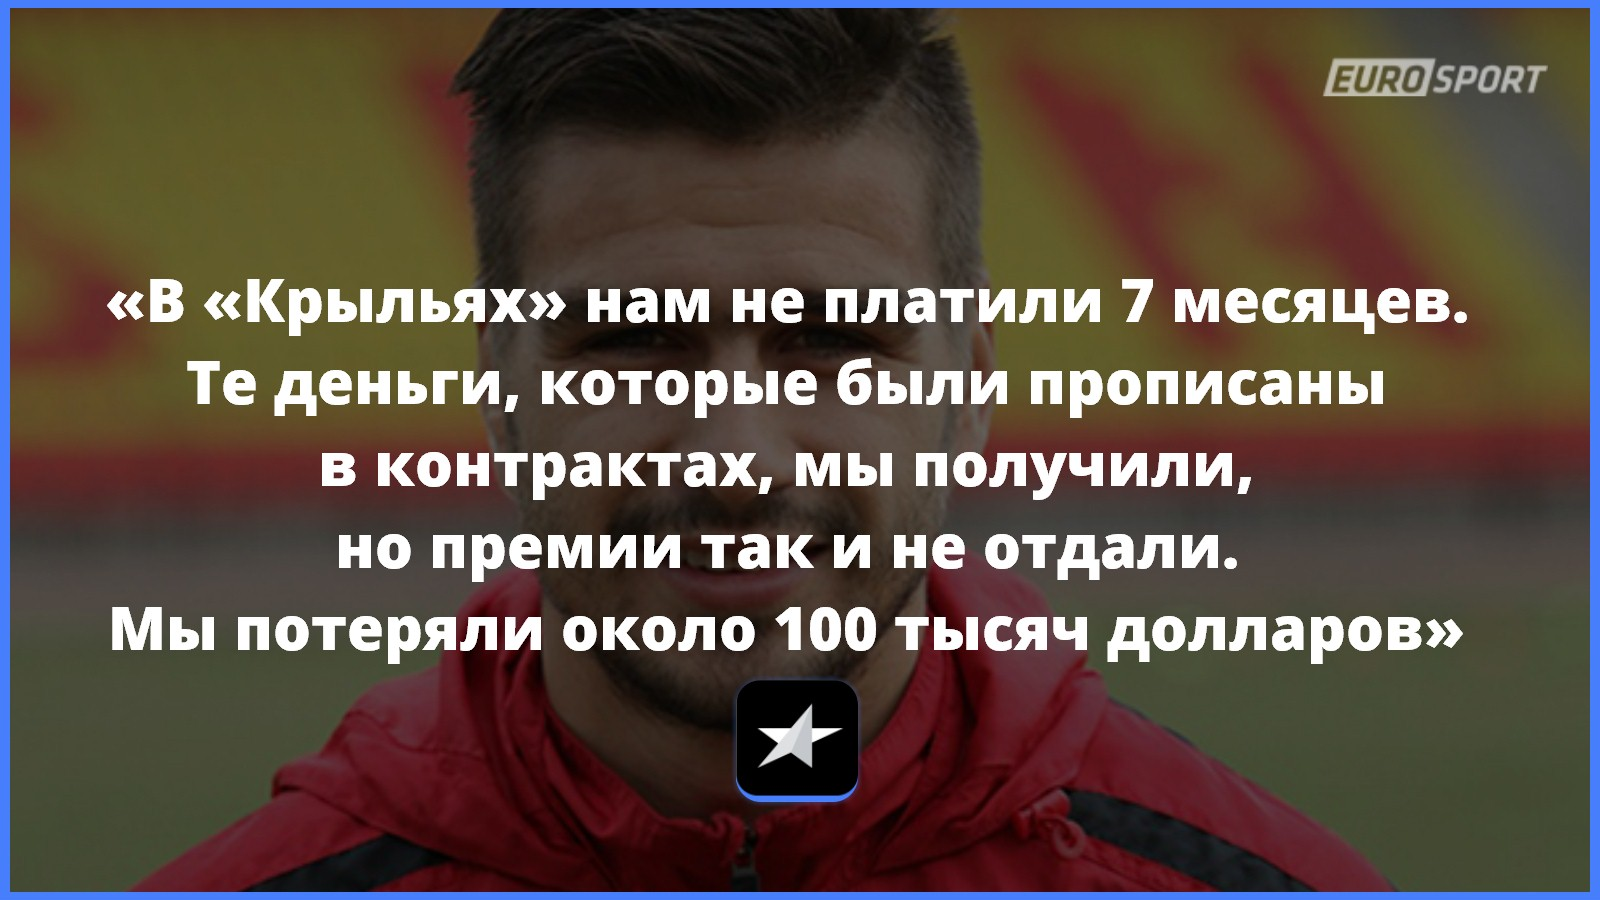 https://i.eurosport.com/2015/08/13/1659388.jpg